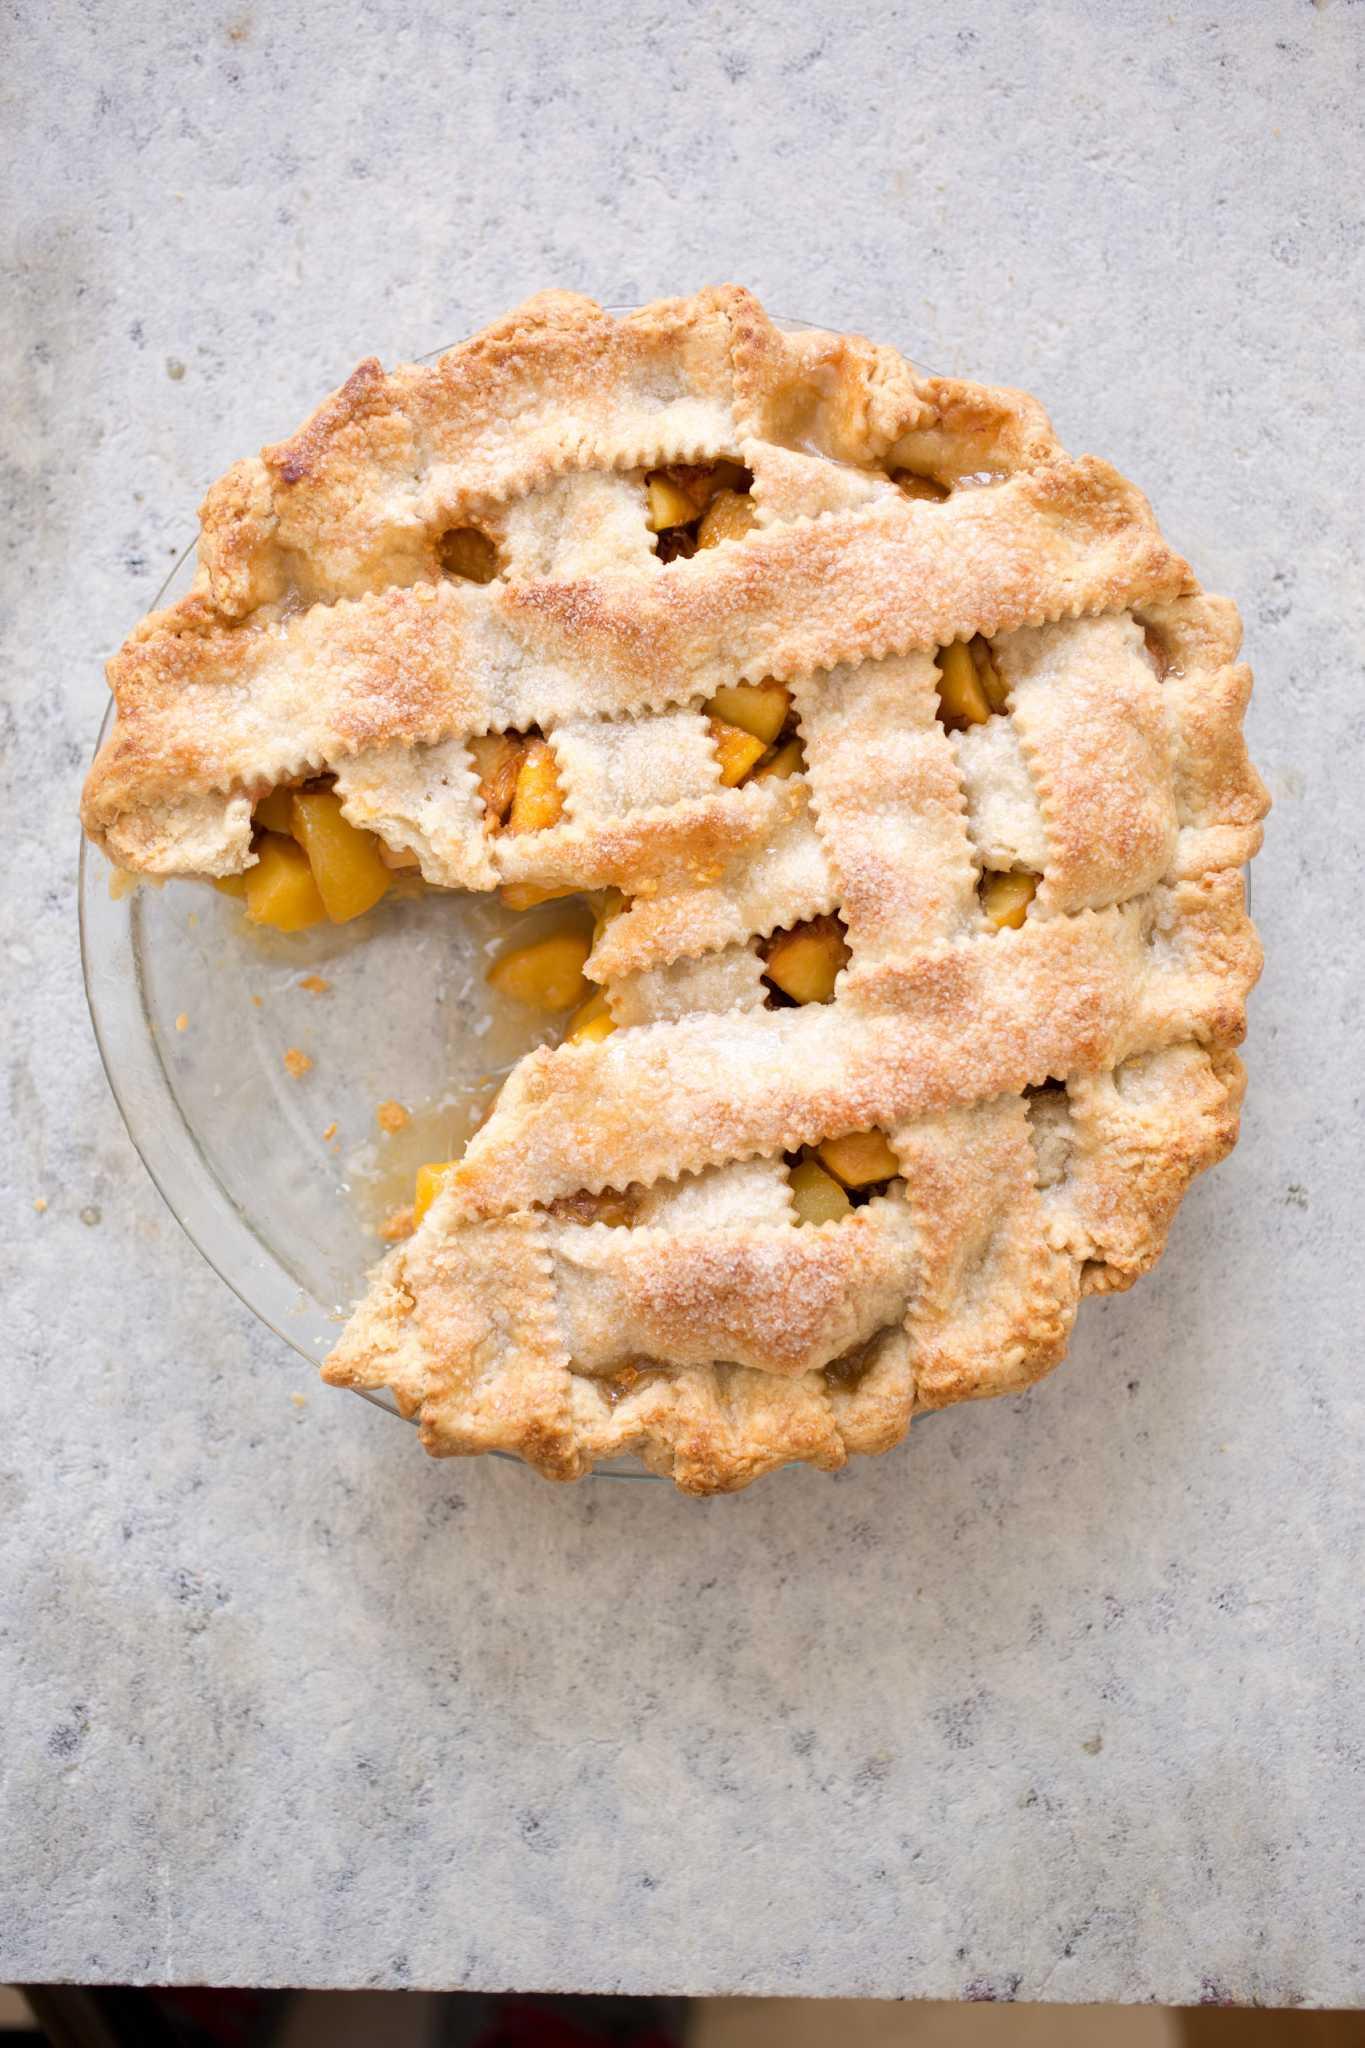 recipe pie dough for lattice top pie houstonchroniclecom - Americas Test Kitchen Apple Pie